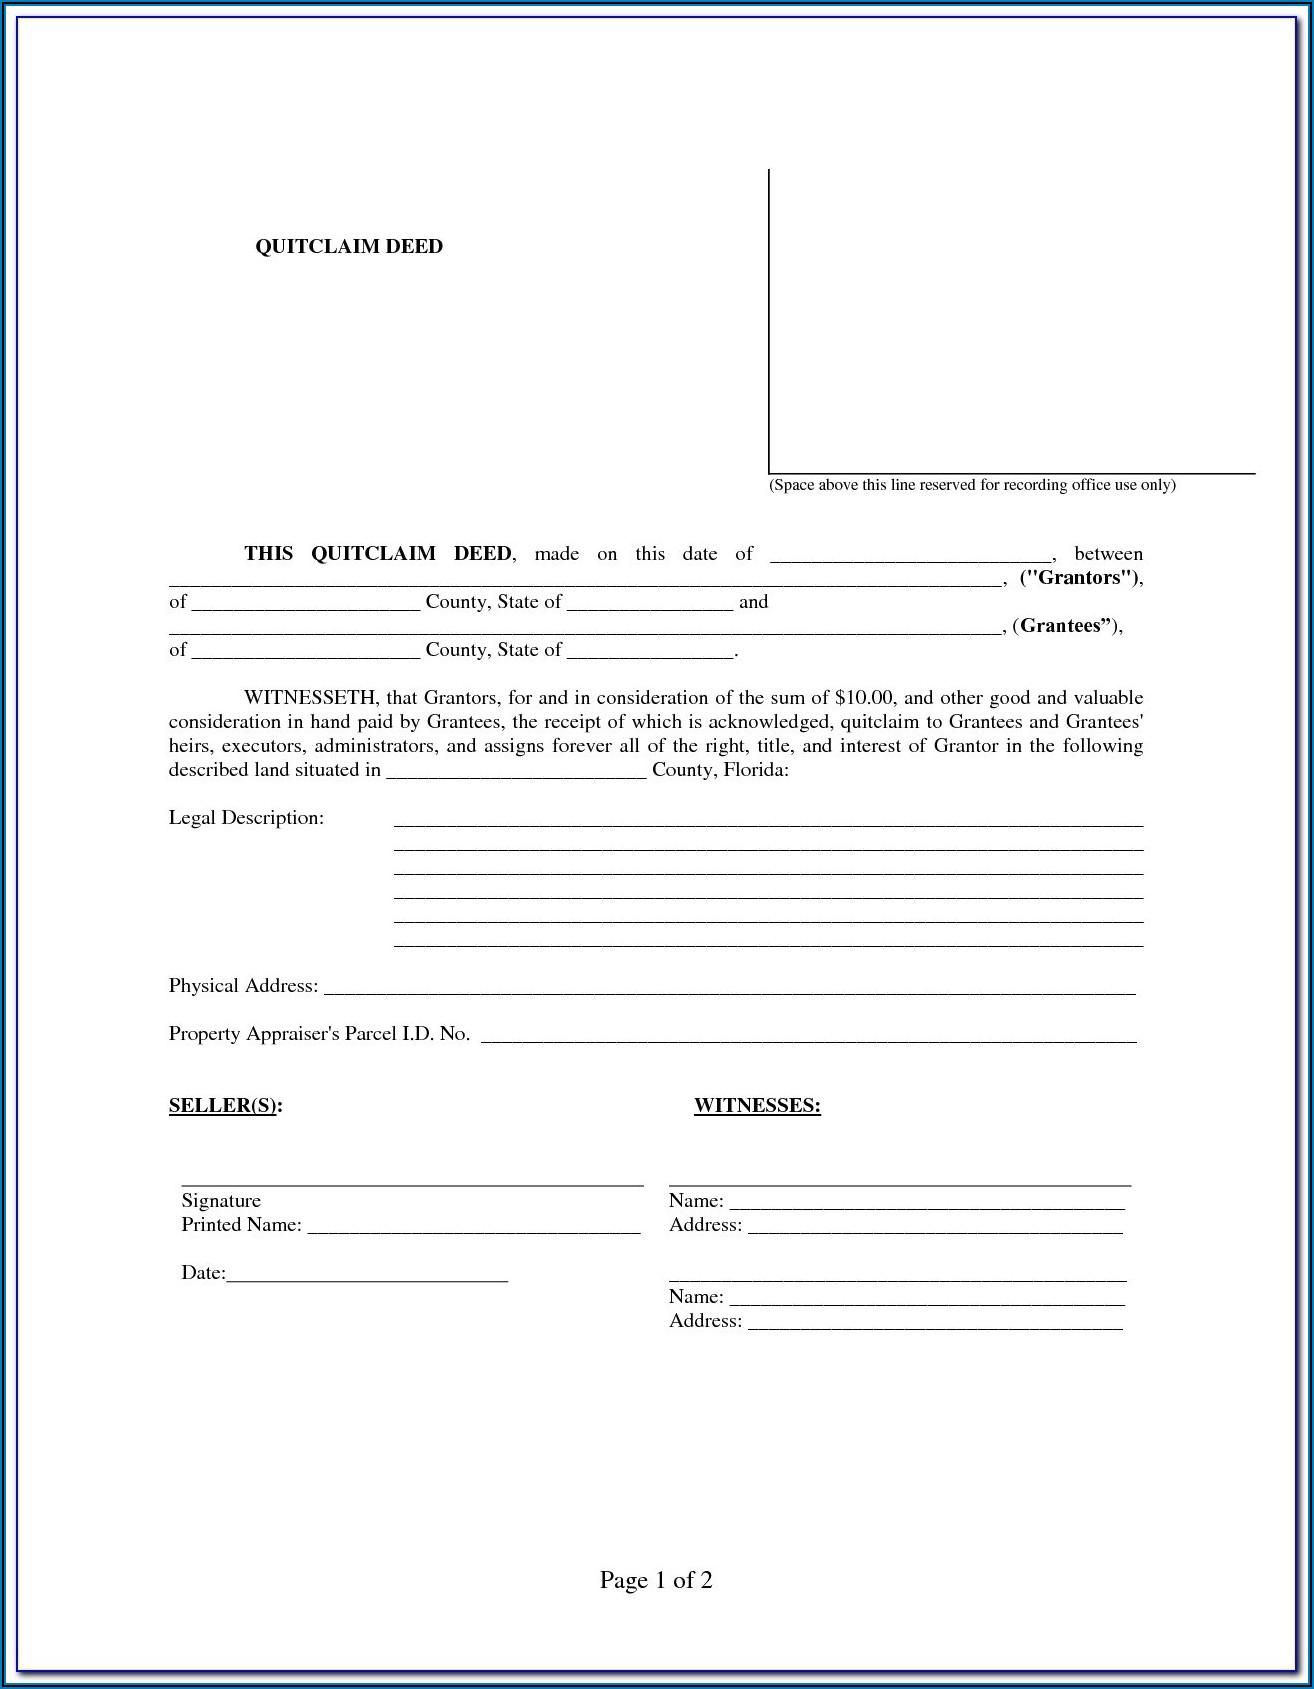 Blank Quit Claim Deed Form Florida